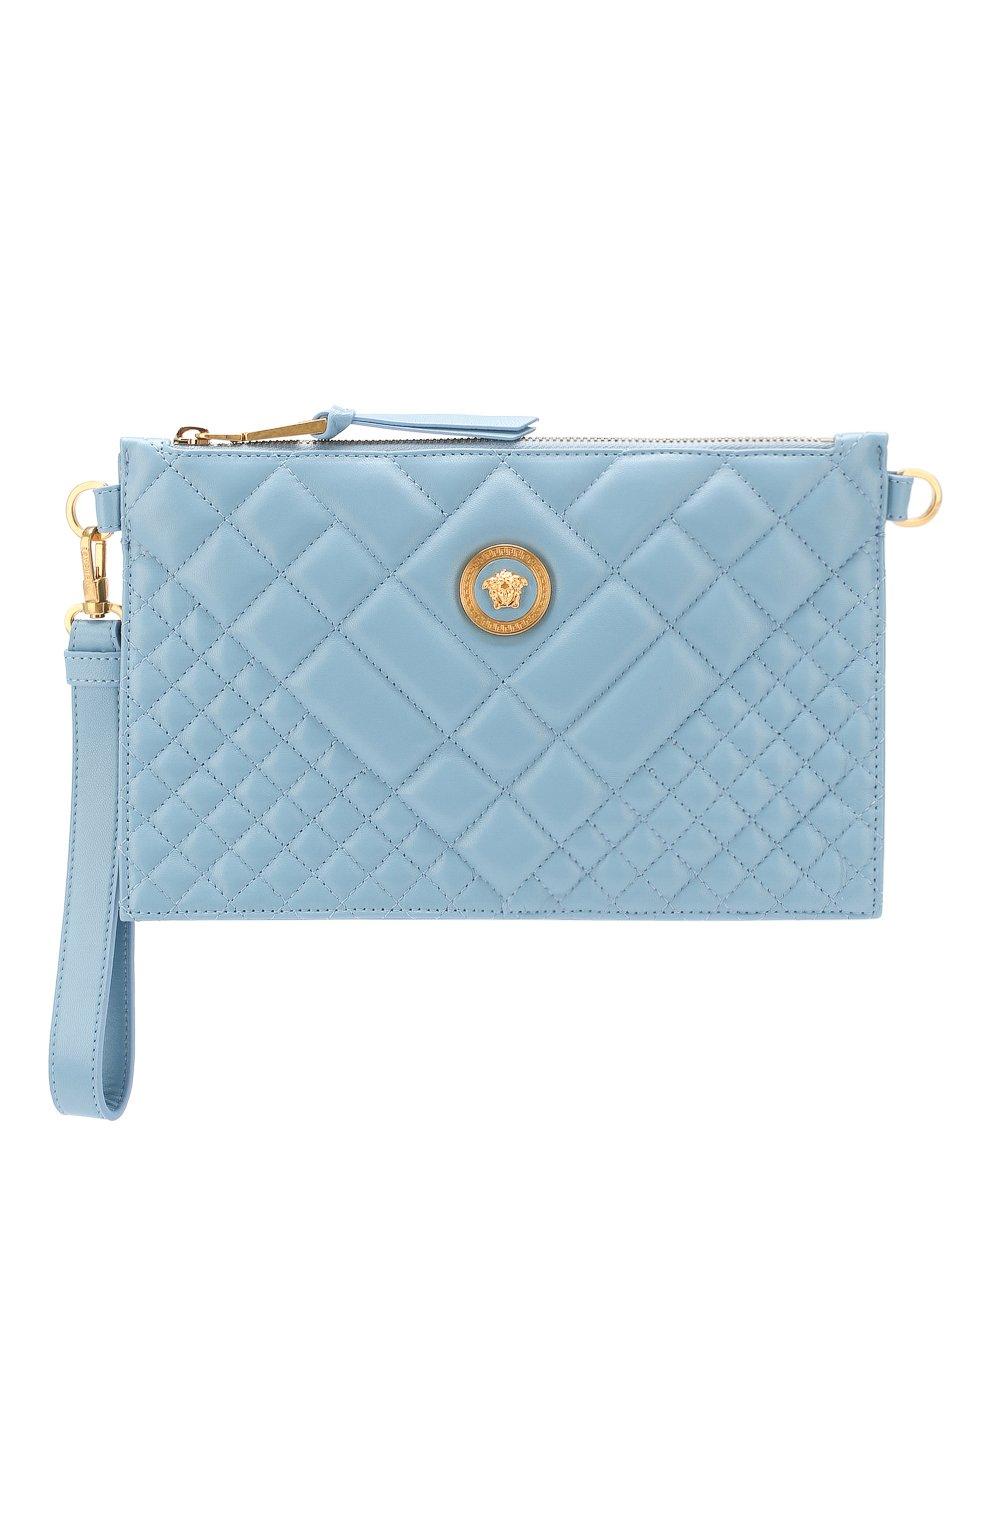 Сумка Quilted Versace голубая цвета   Фото №7